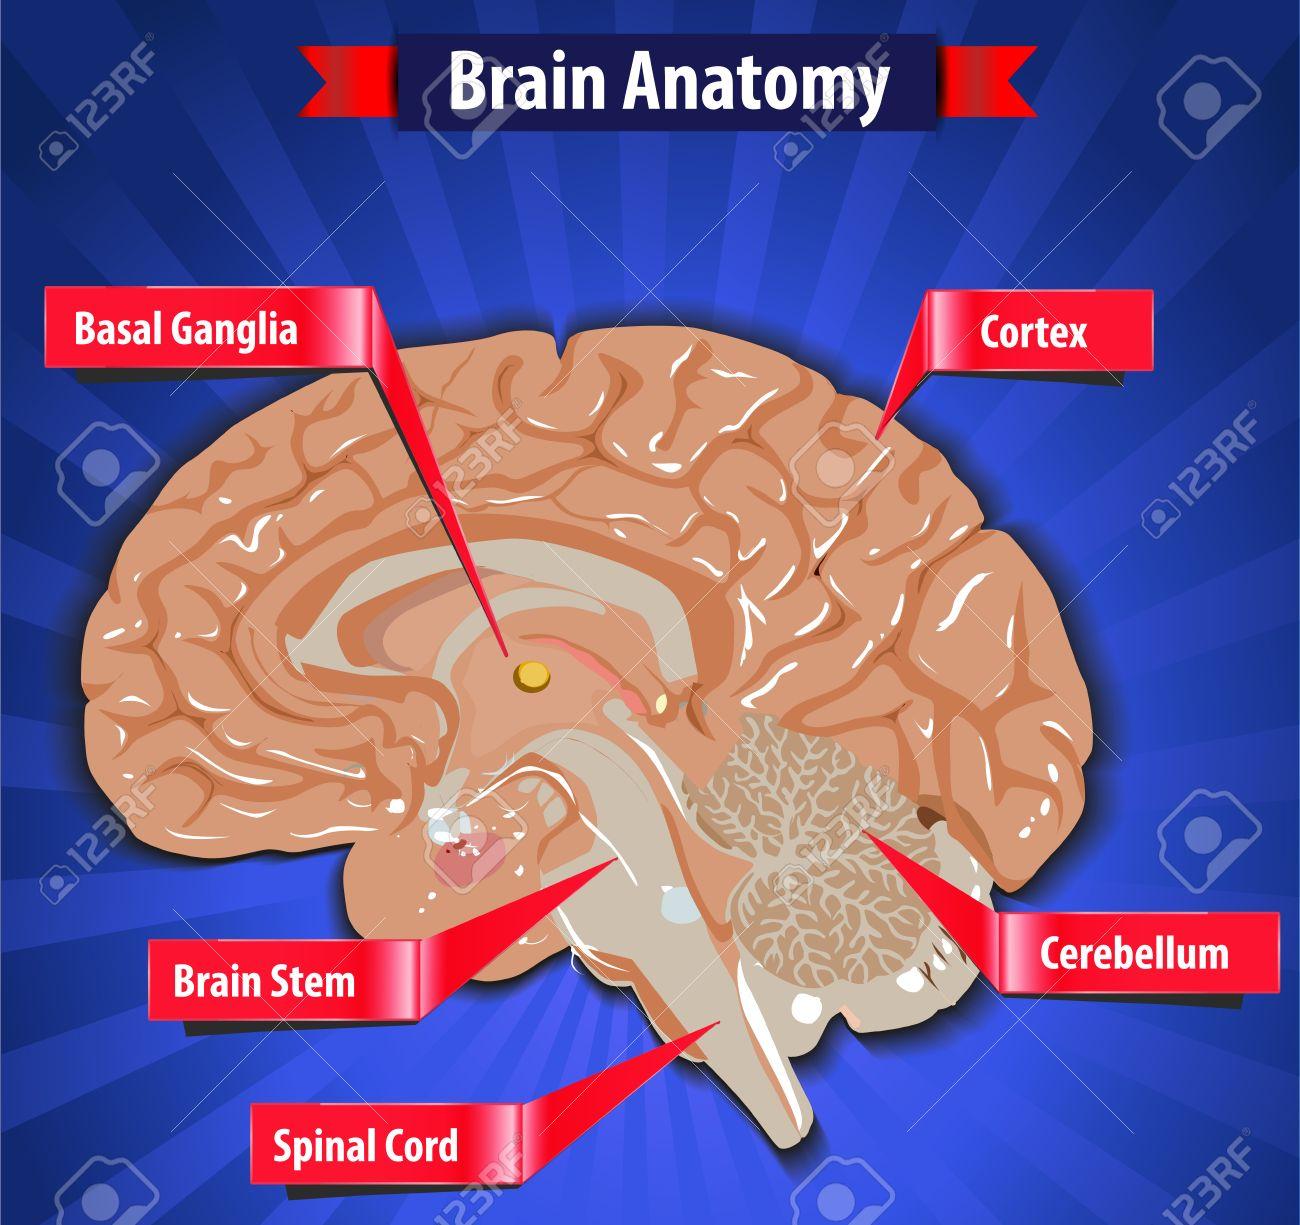 Brain Function, Human Brain Anatomy With Basal Ganglia, Cortex ...